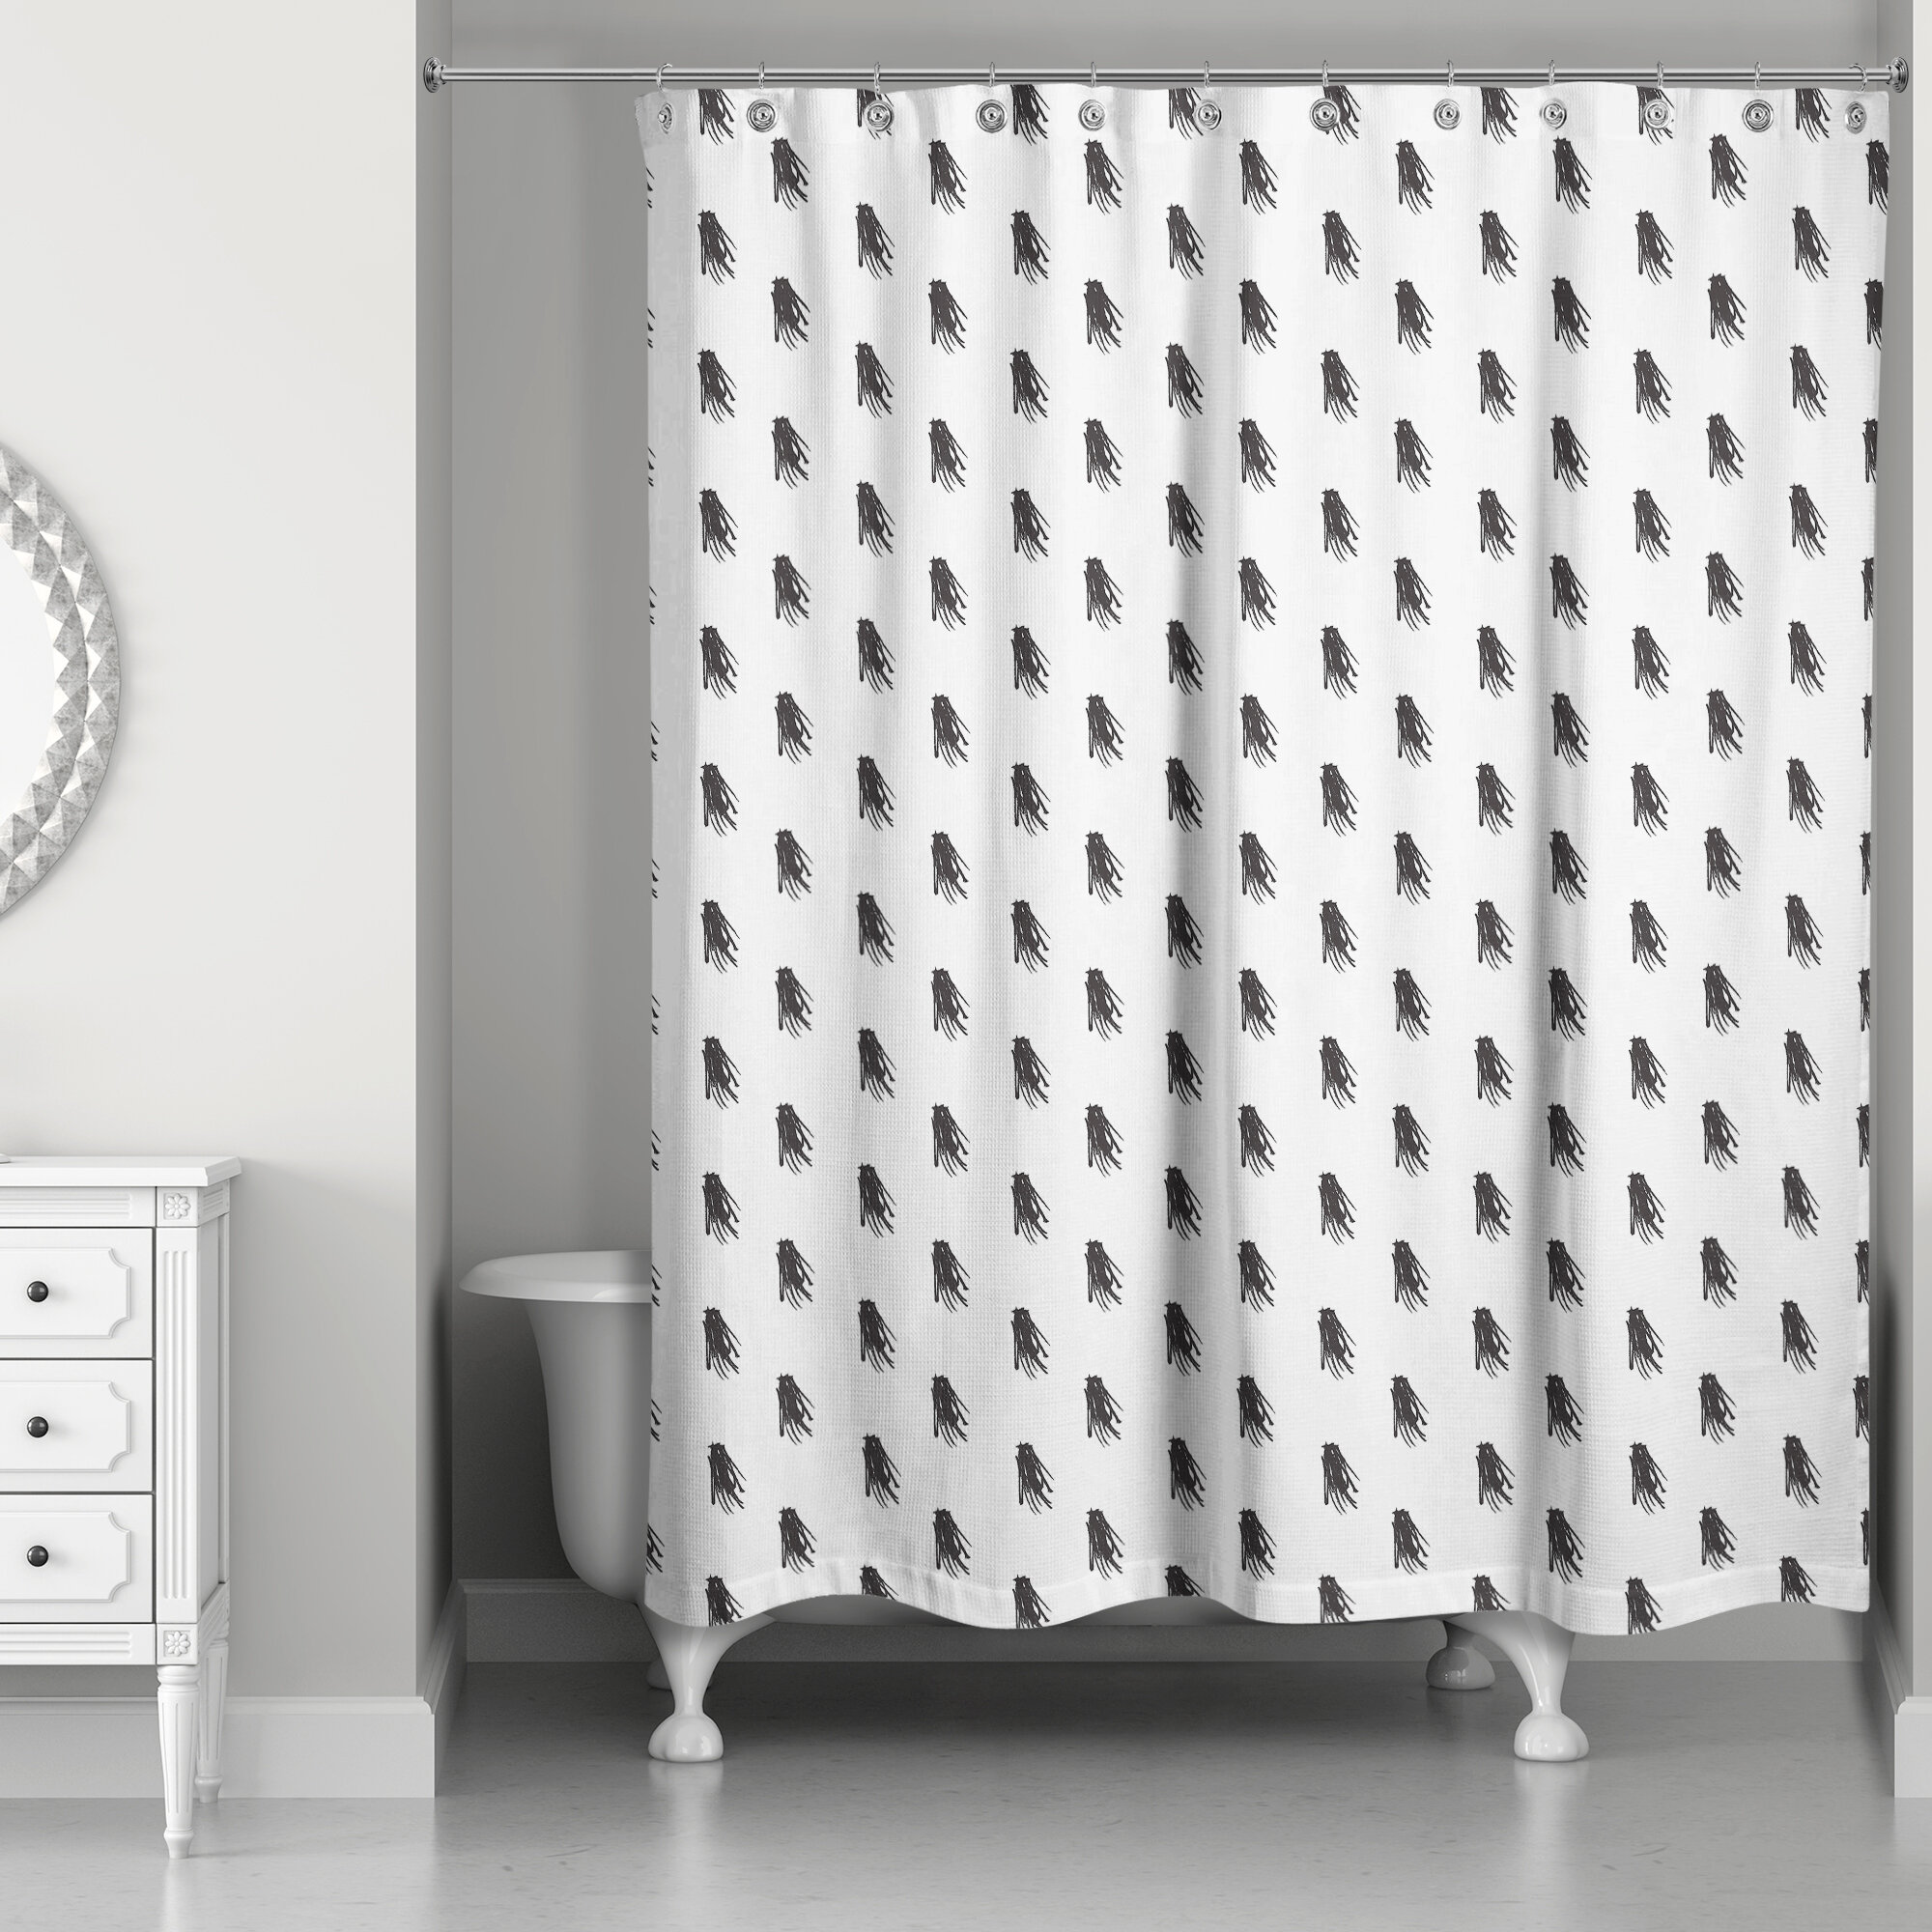 Brayden Studio Nowell Tassel Print Shower Curtain | Wayfair